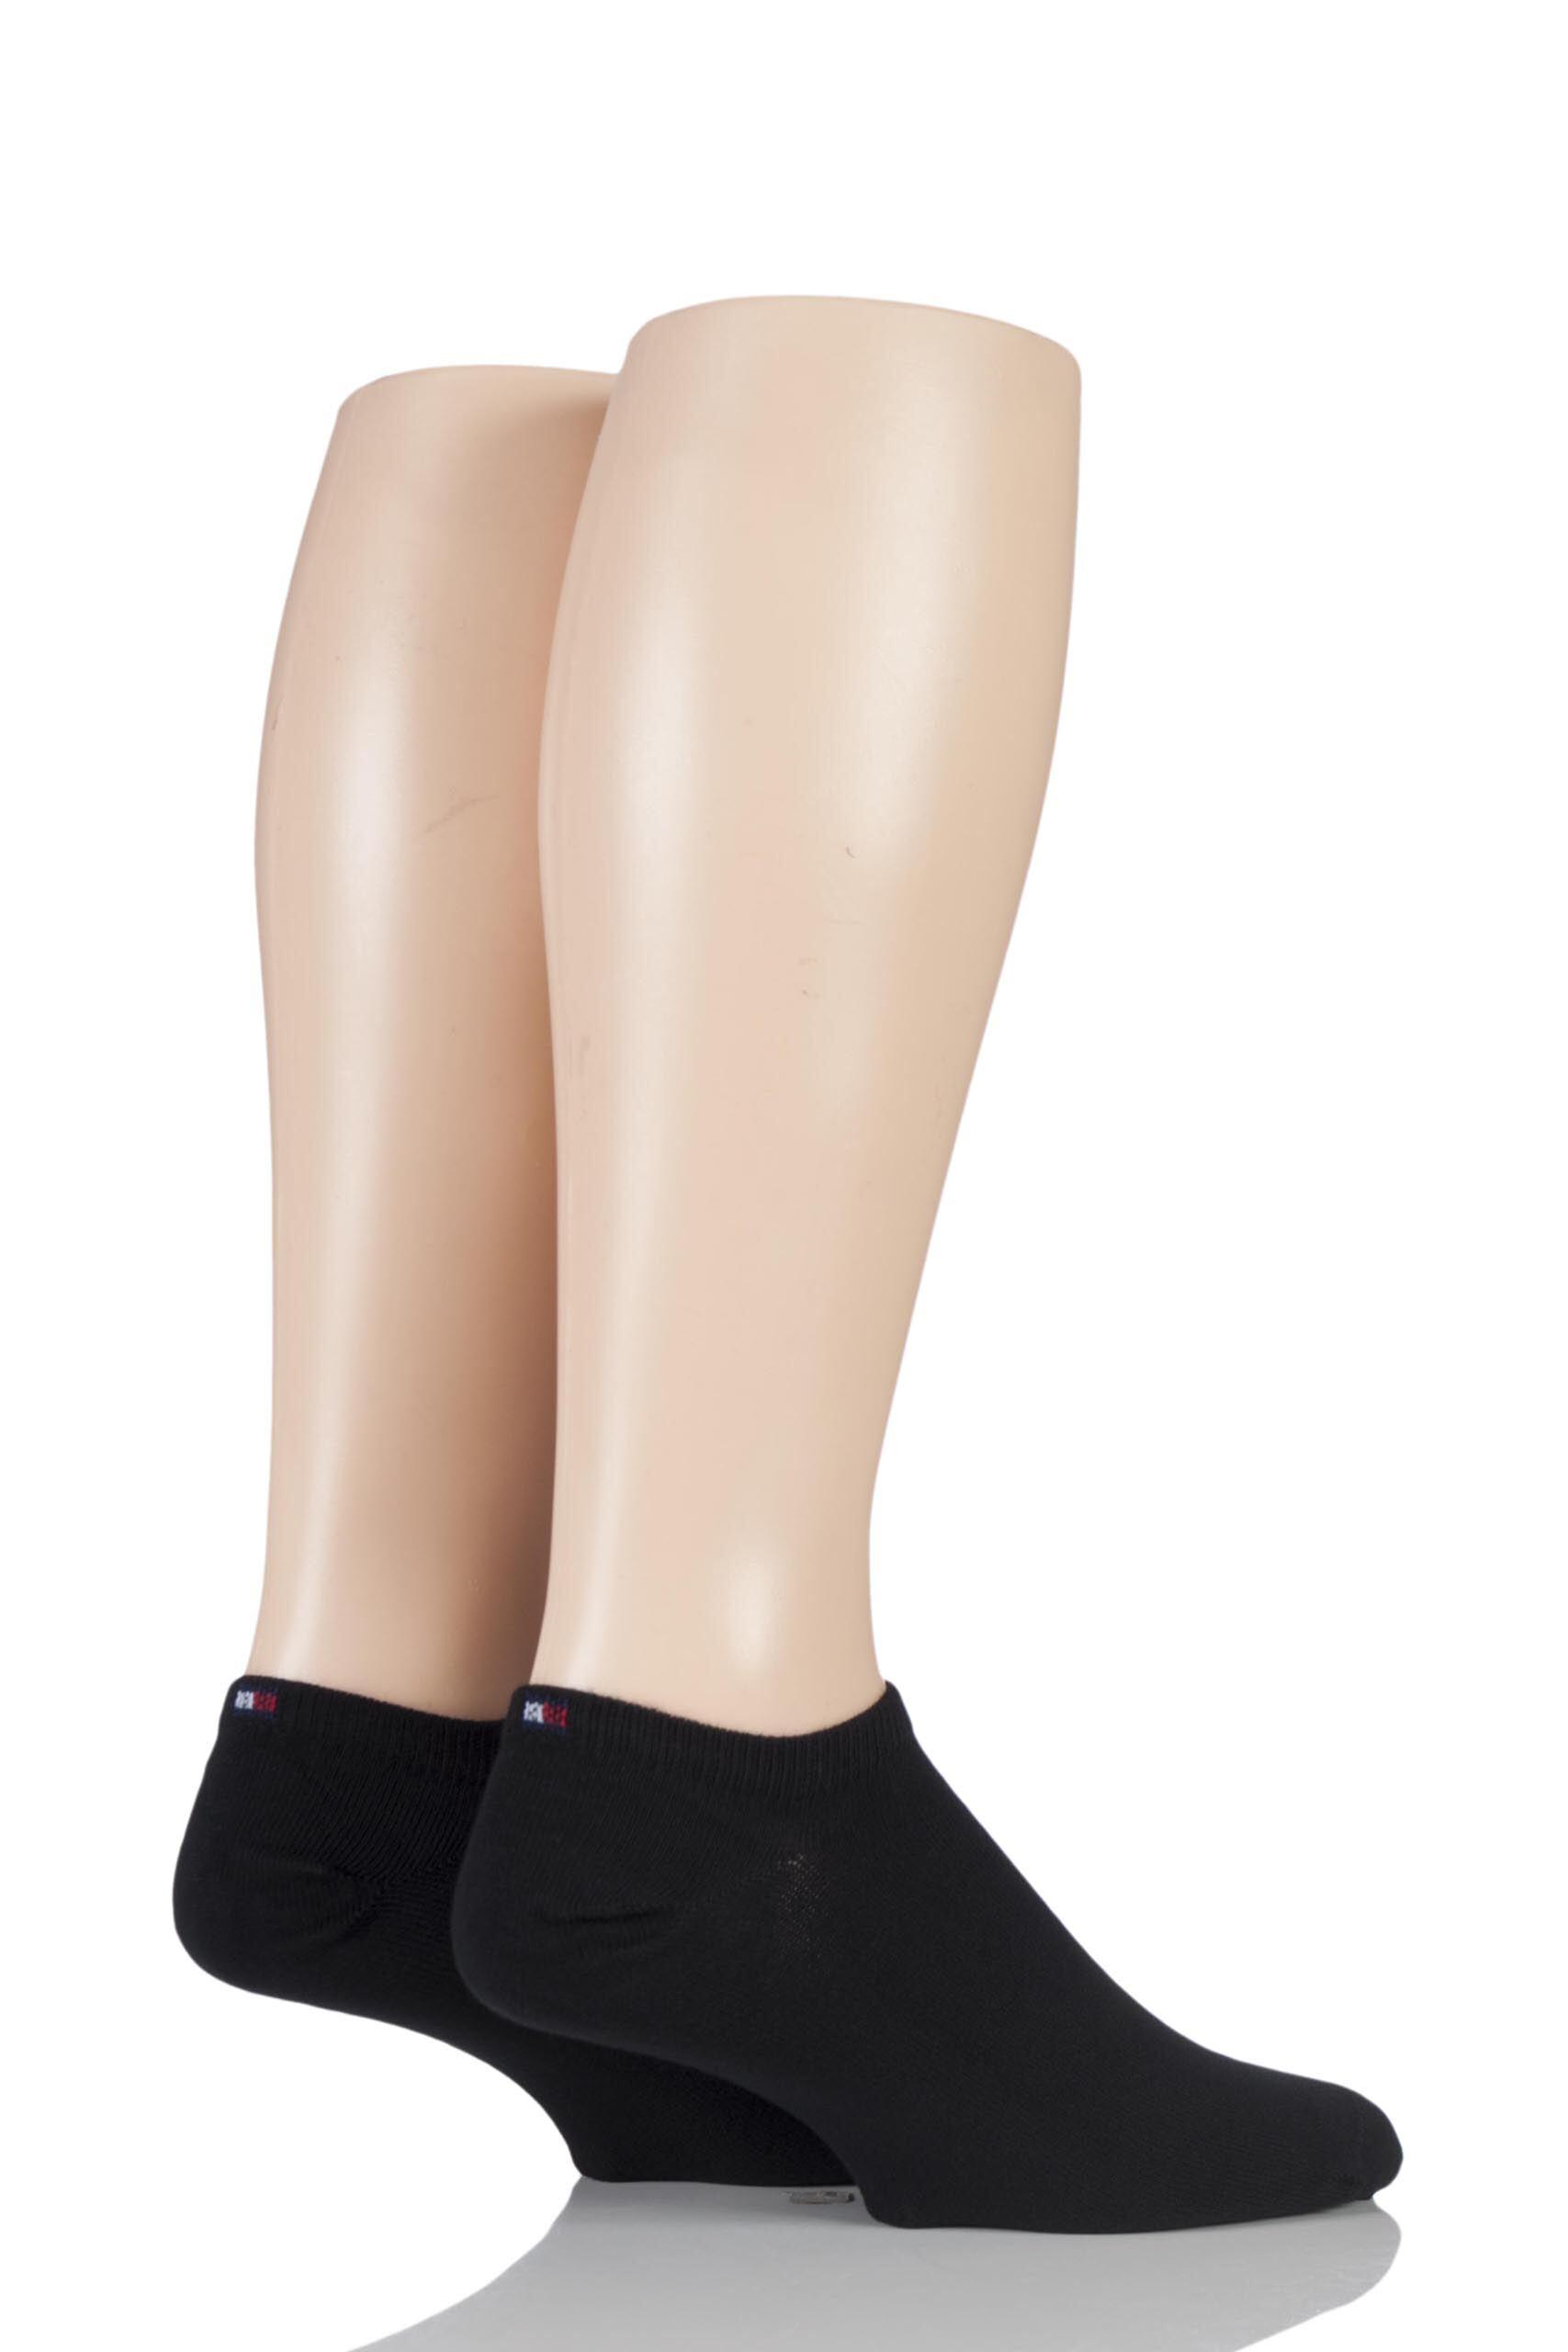 2 Pair Black Plain Cotton Sneaker Socks Men's 9-11 Mens - Tommy Hilfiger